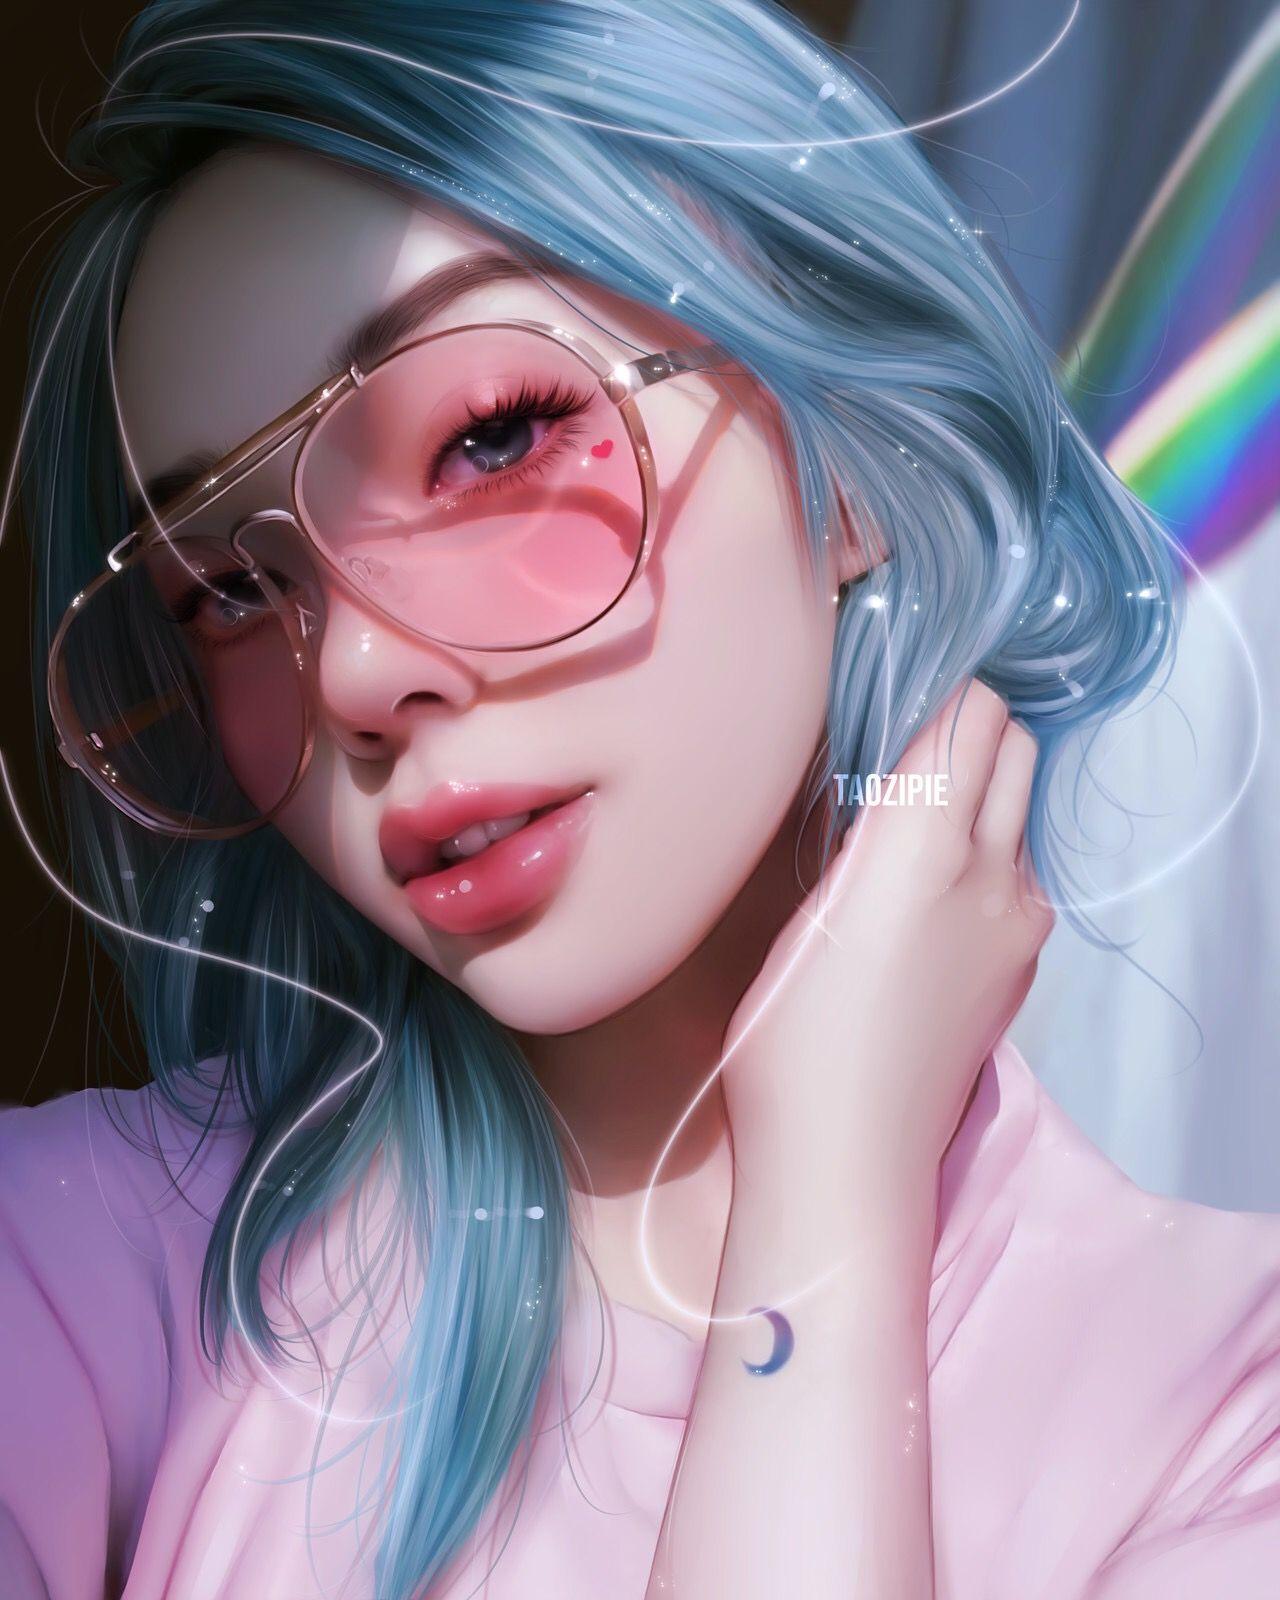 Love And Other Things Visualartzi Digital Art Romance Eyes Character Design Blue Hair Hearts Realis Digital Art Girl How To Draw Hair Digital Portrait Art